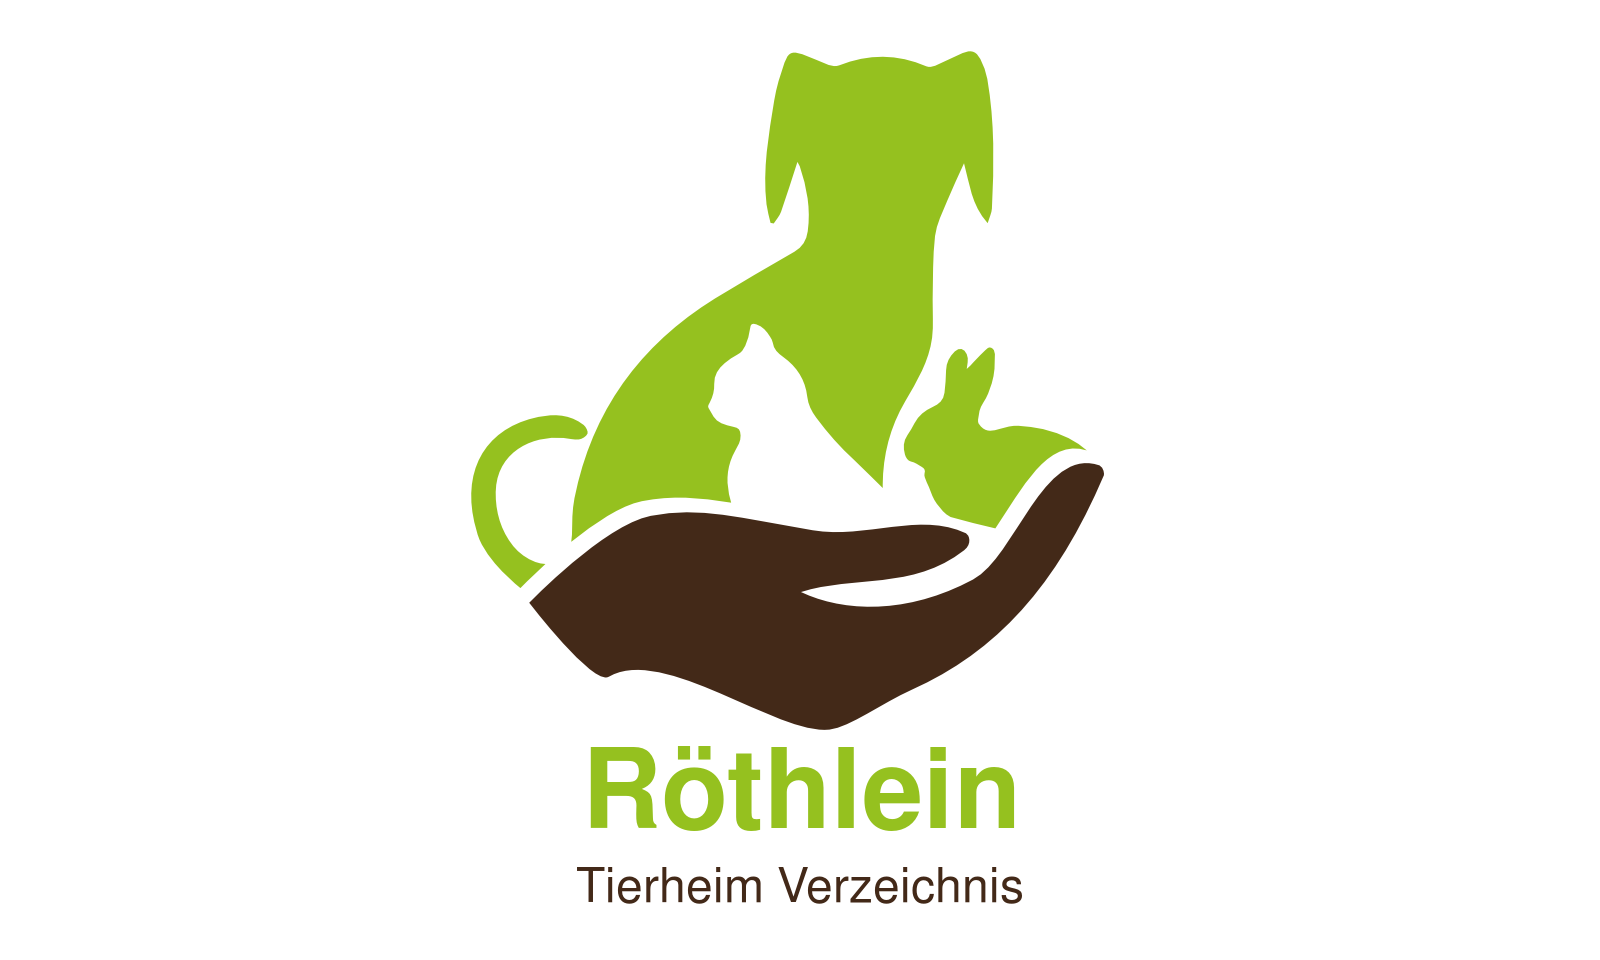 Tierheim Röthlein